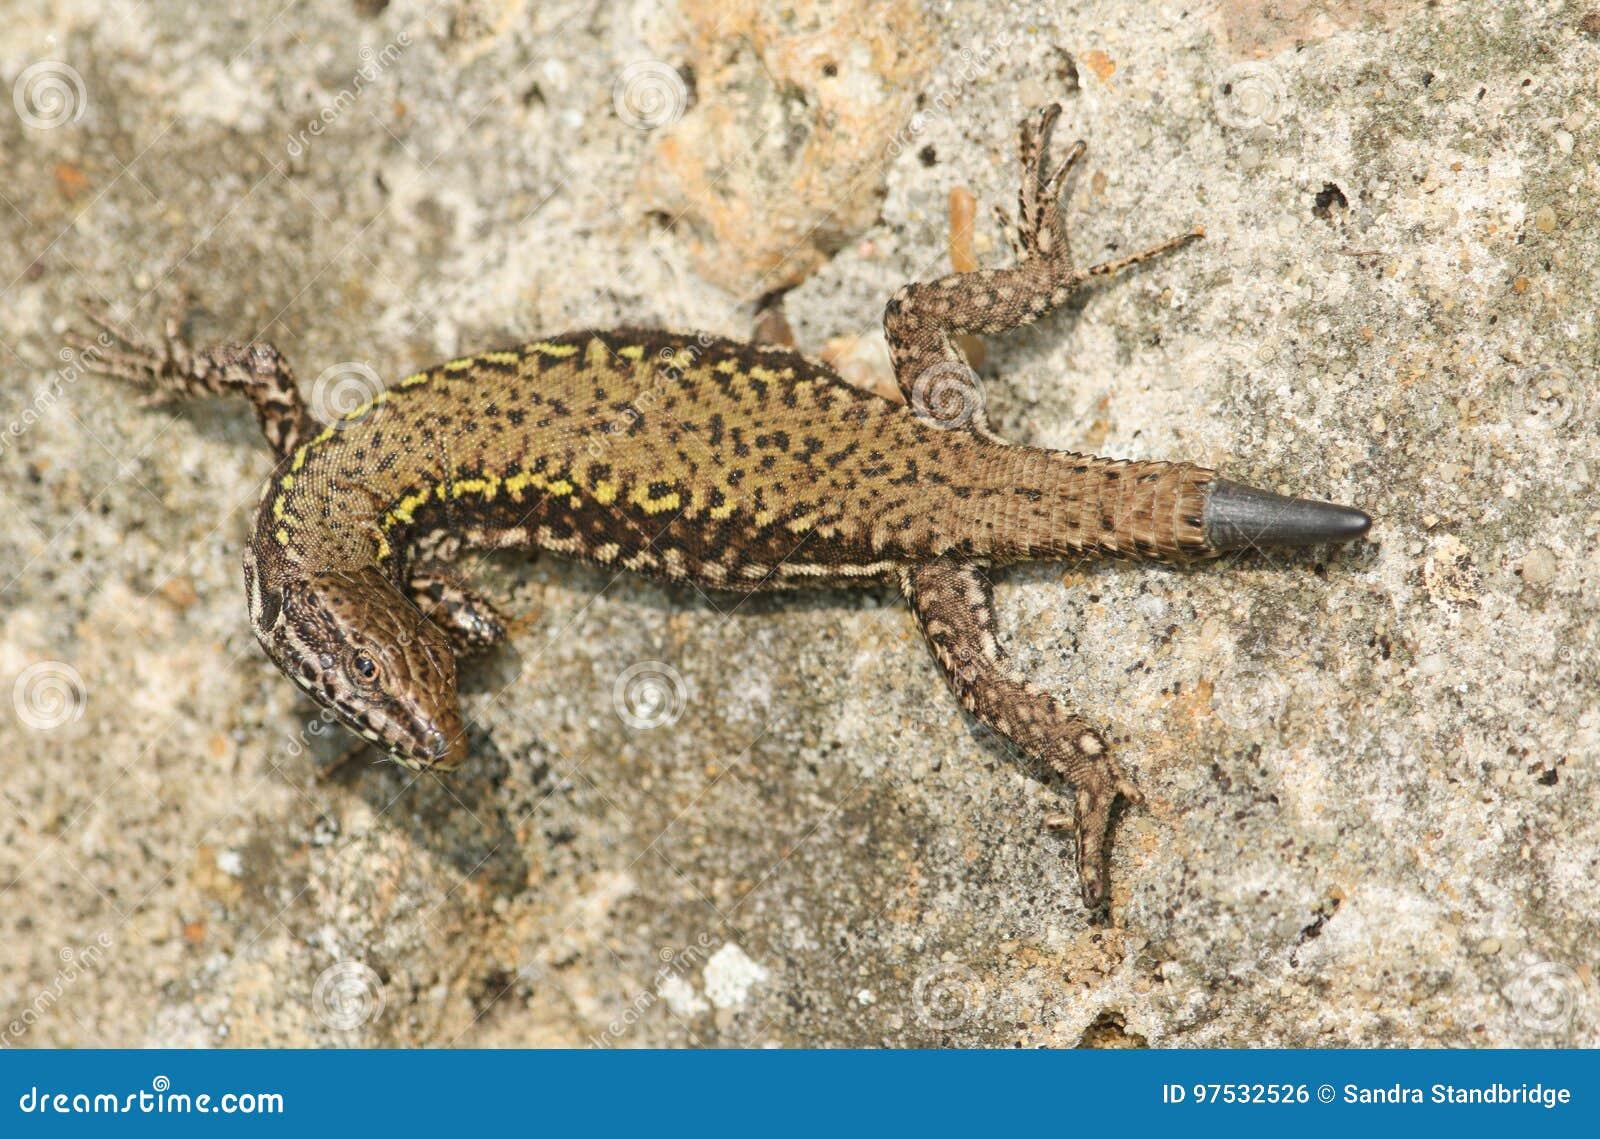 A beautiful Wall Lizard Podarcis muralis sunning itself on a stone wall.